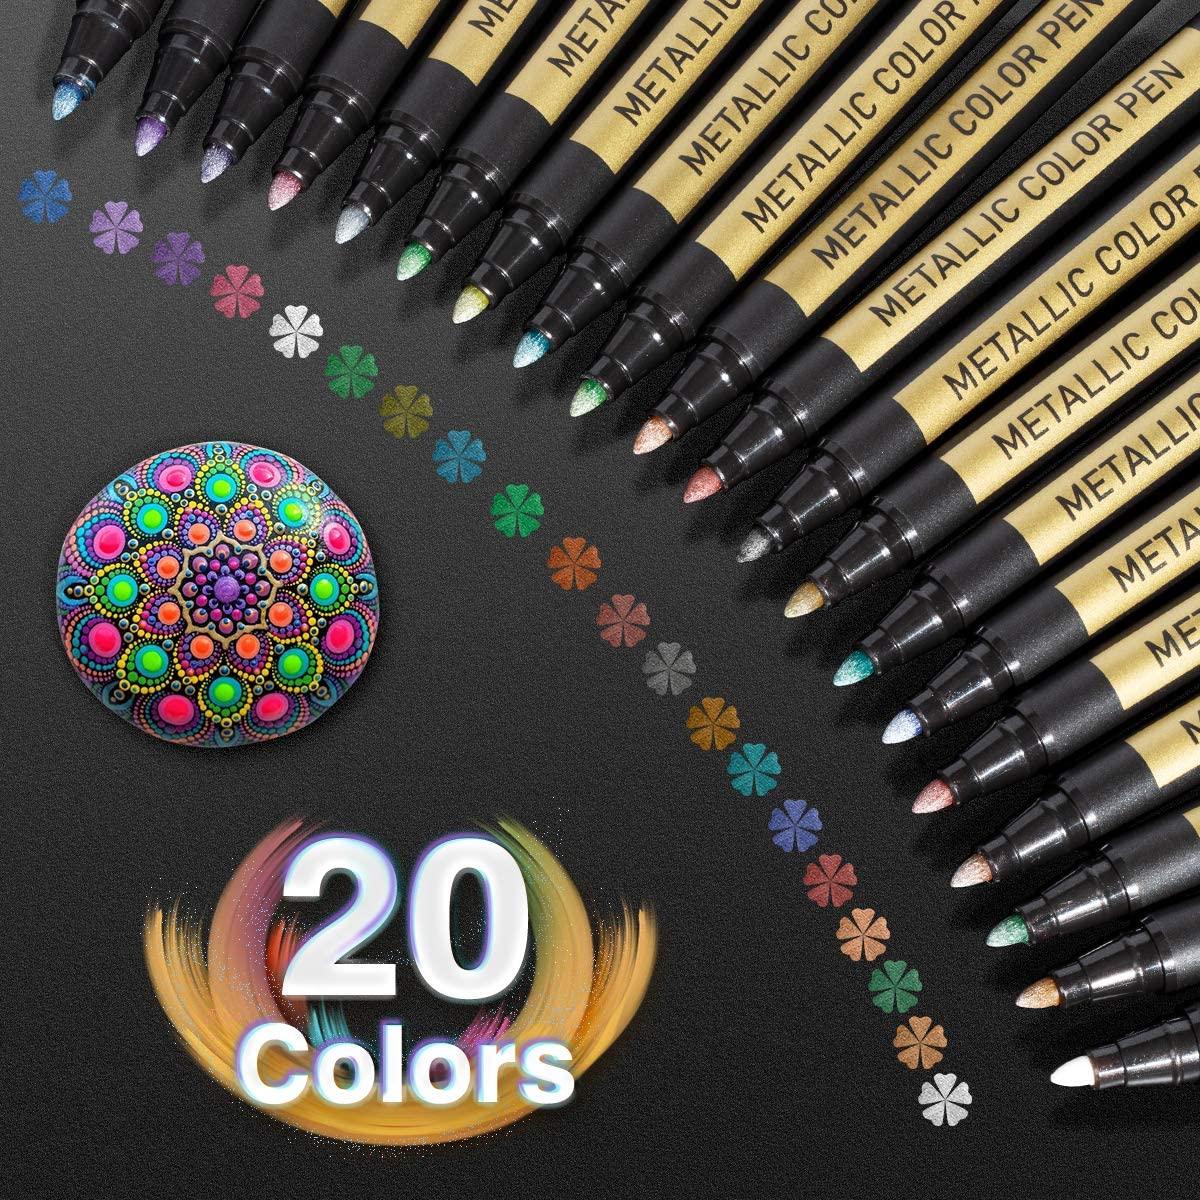 10/20 Color Metallic Paint Marker Pen Permanent Writing Rock Painting Photo Album Scrapbook Glass Wood Canvas Card Art marker